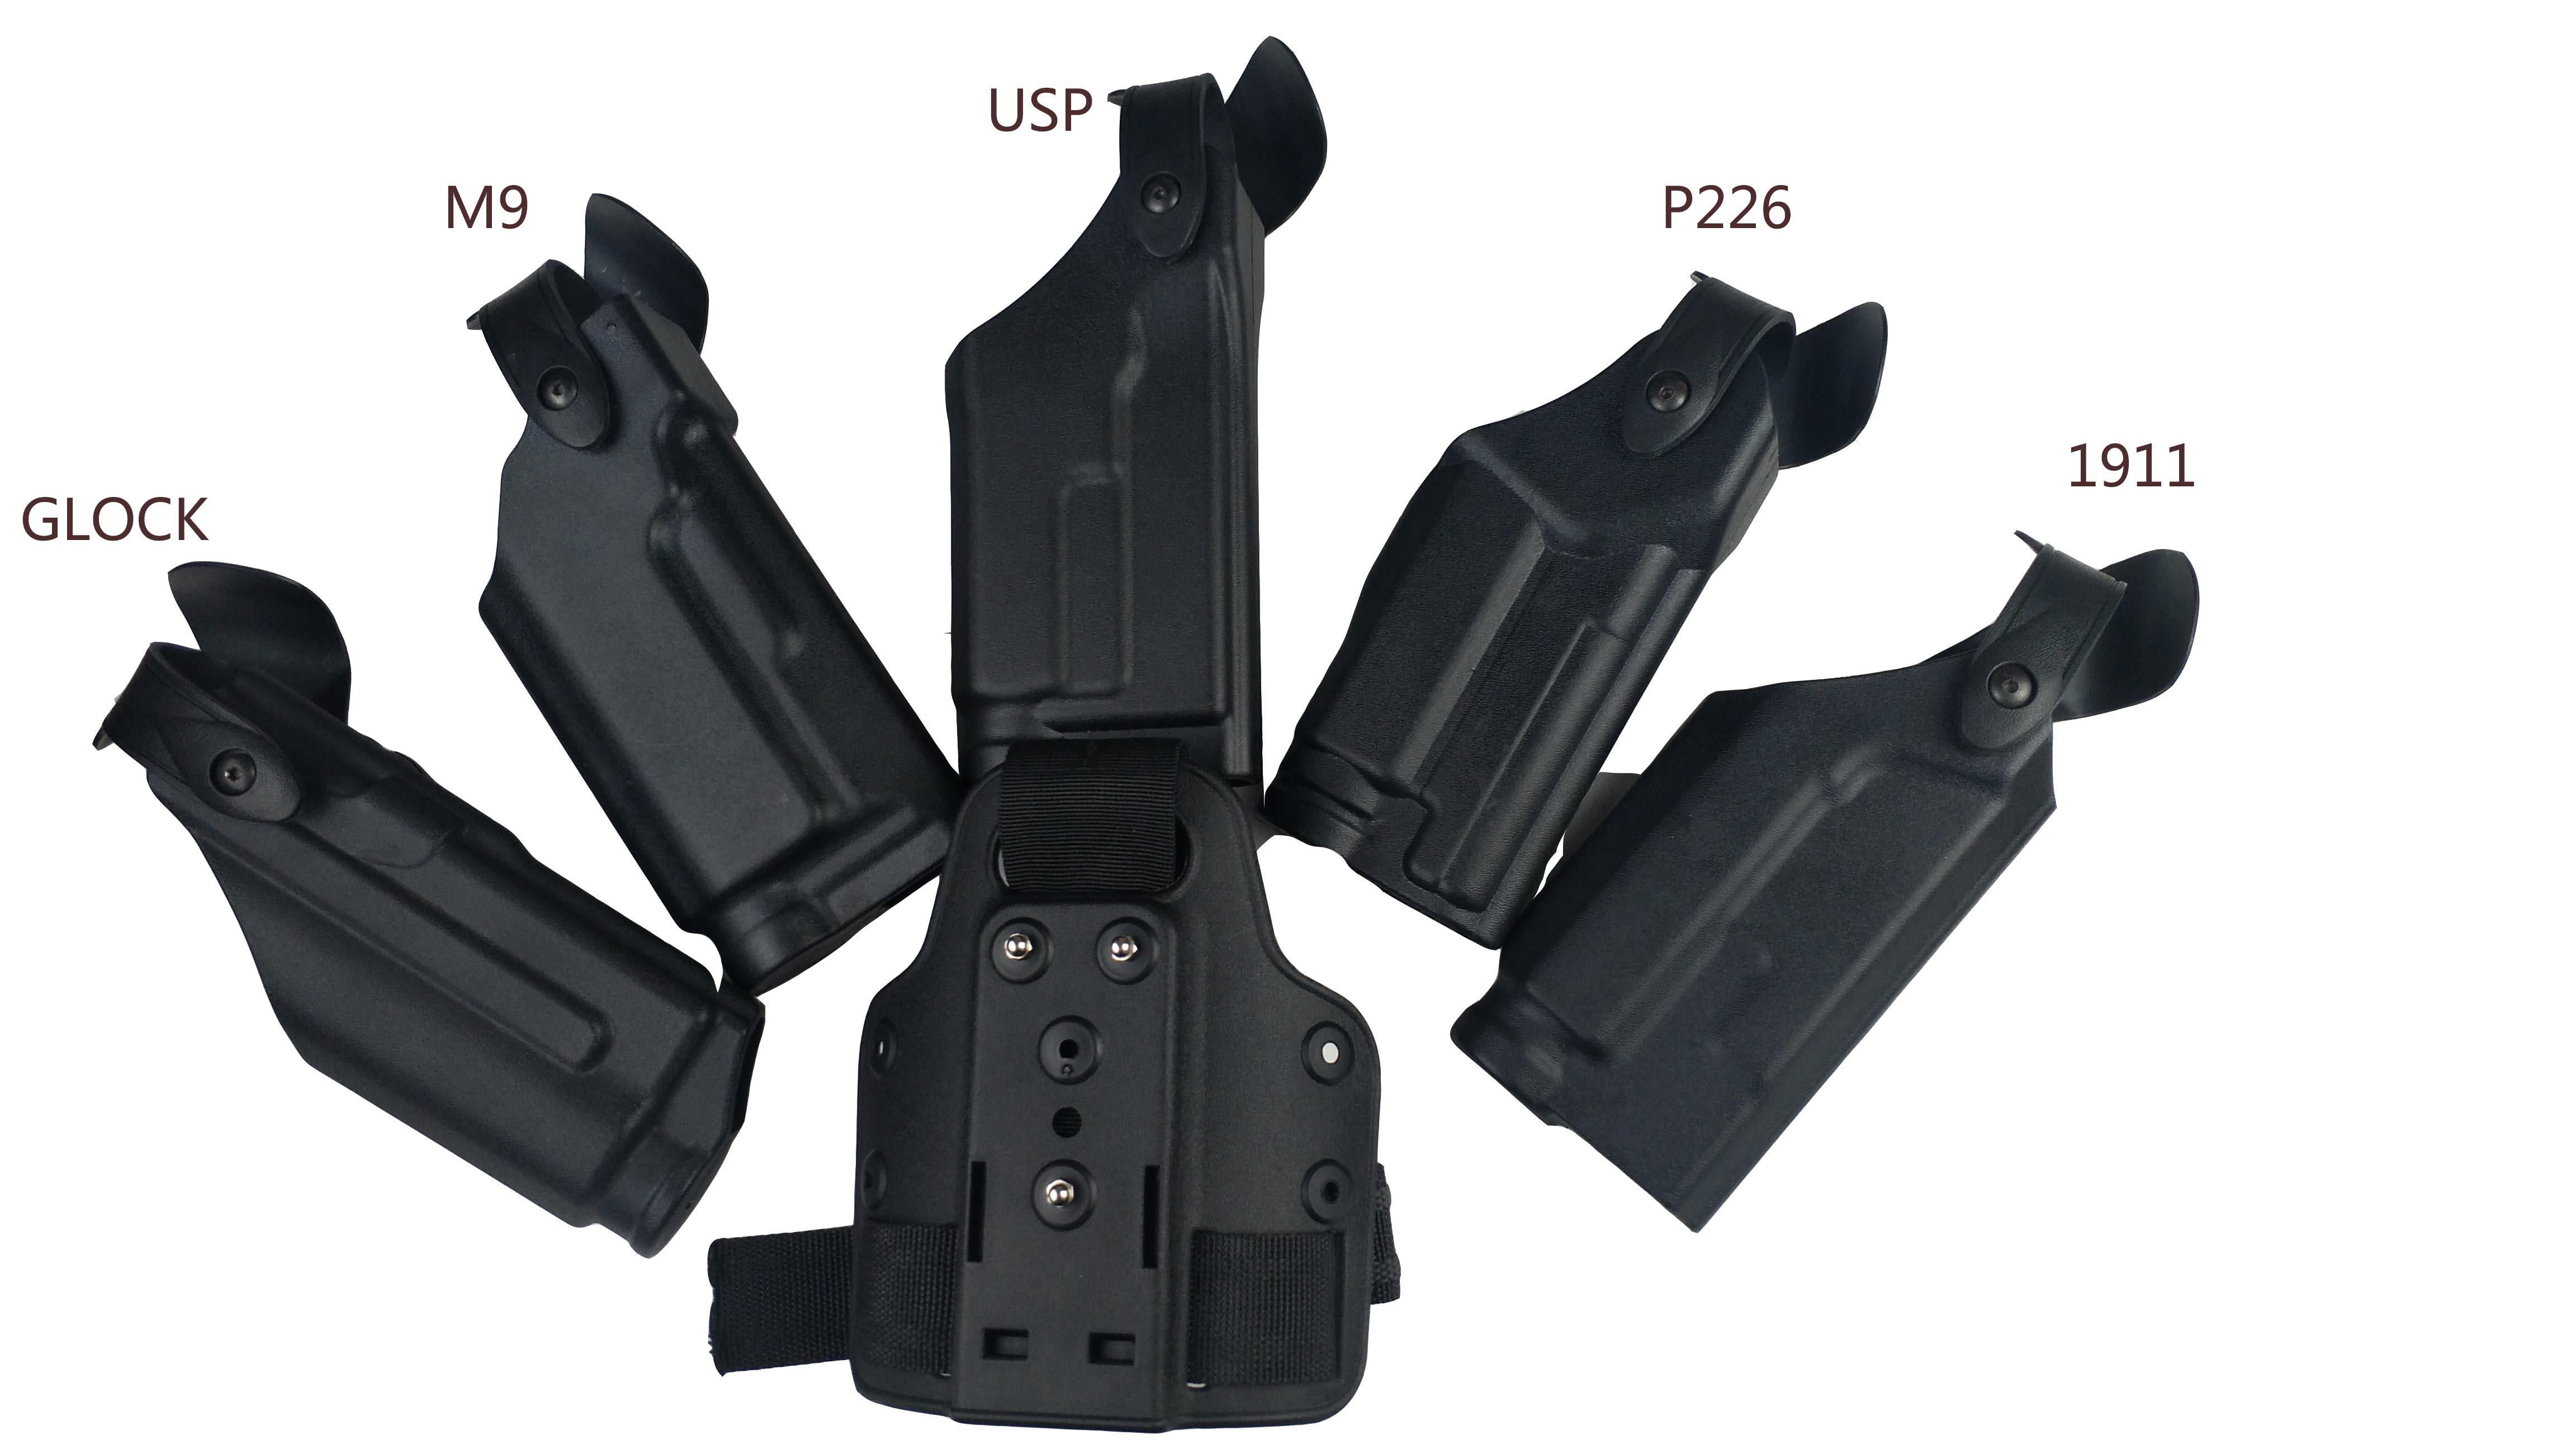 Military Safariland P226/M9/1911/glock/usp Light Bearing Belt Waist Gun Holster Hunting Gun Accessories Leg Holster SIG Thigh Ho